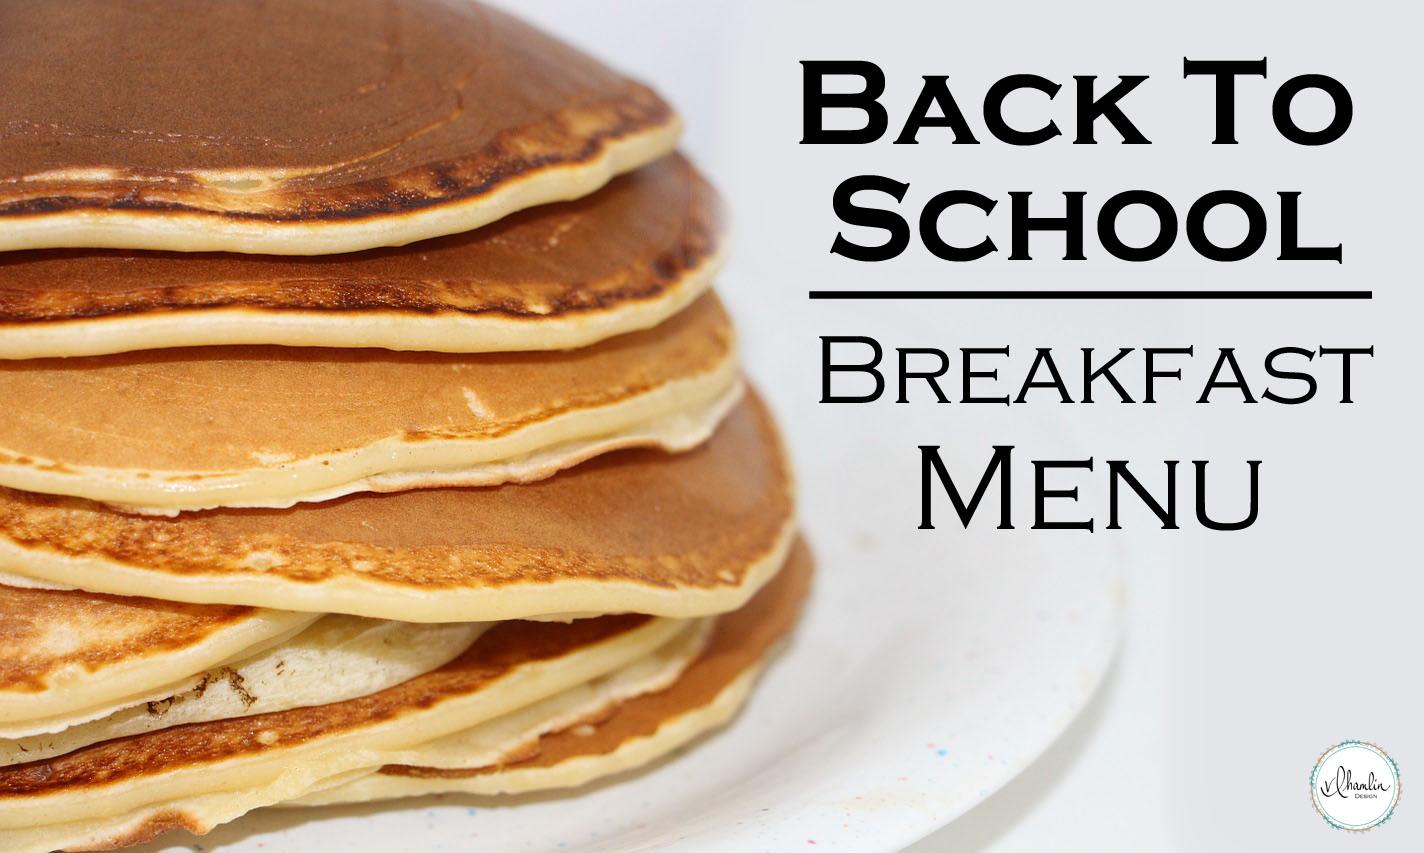 Back to School Breakfast Menu